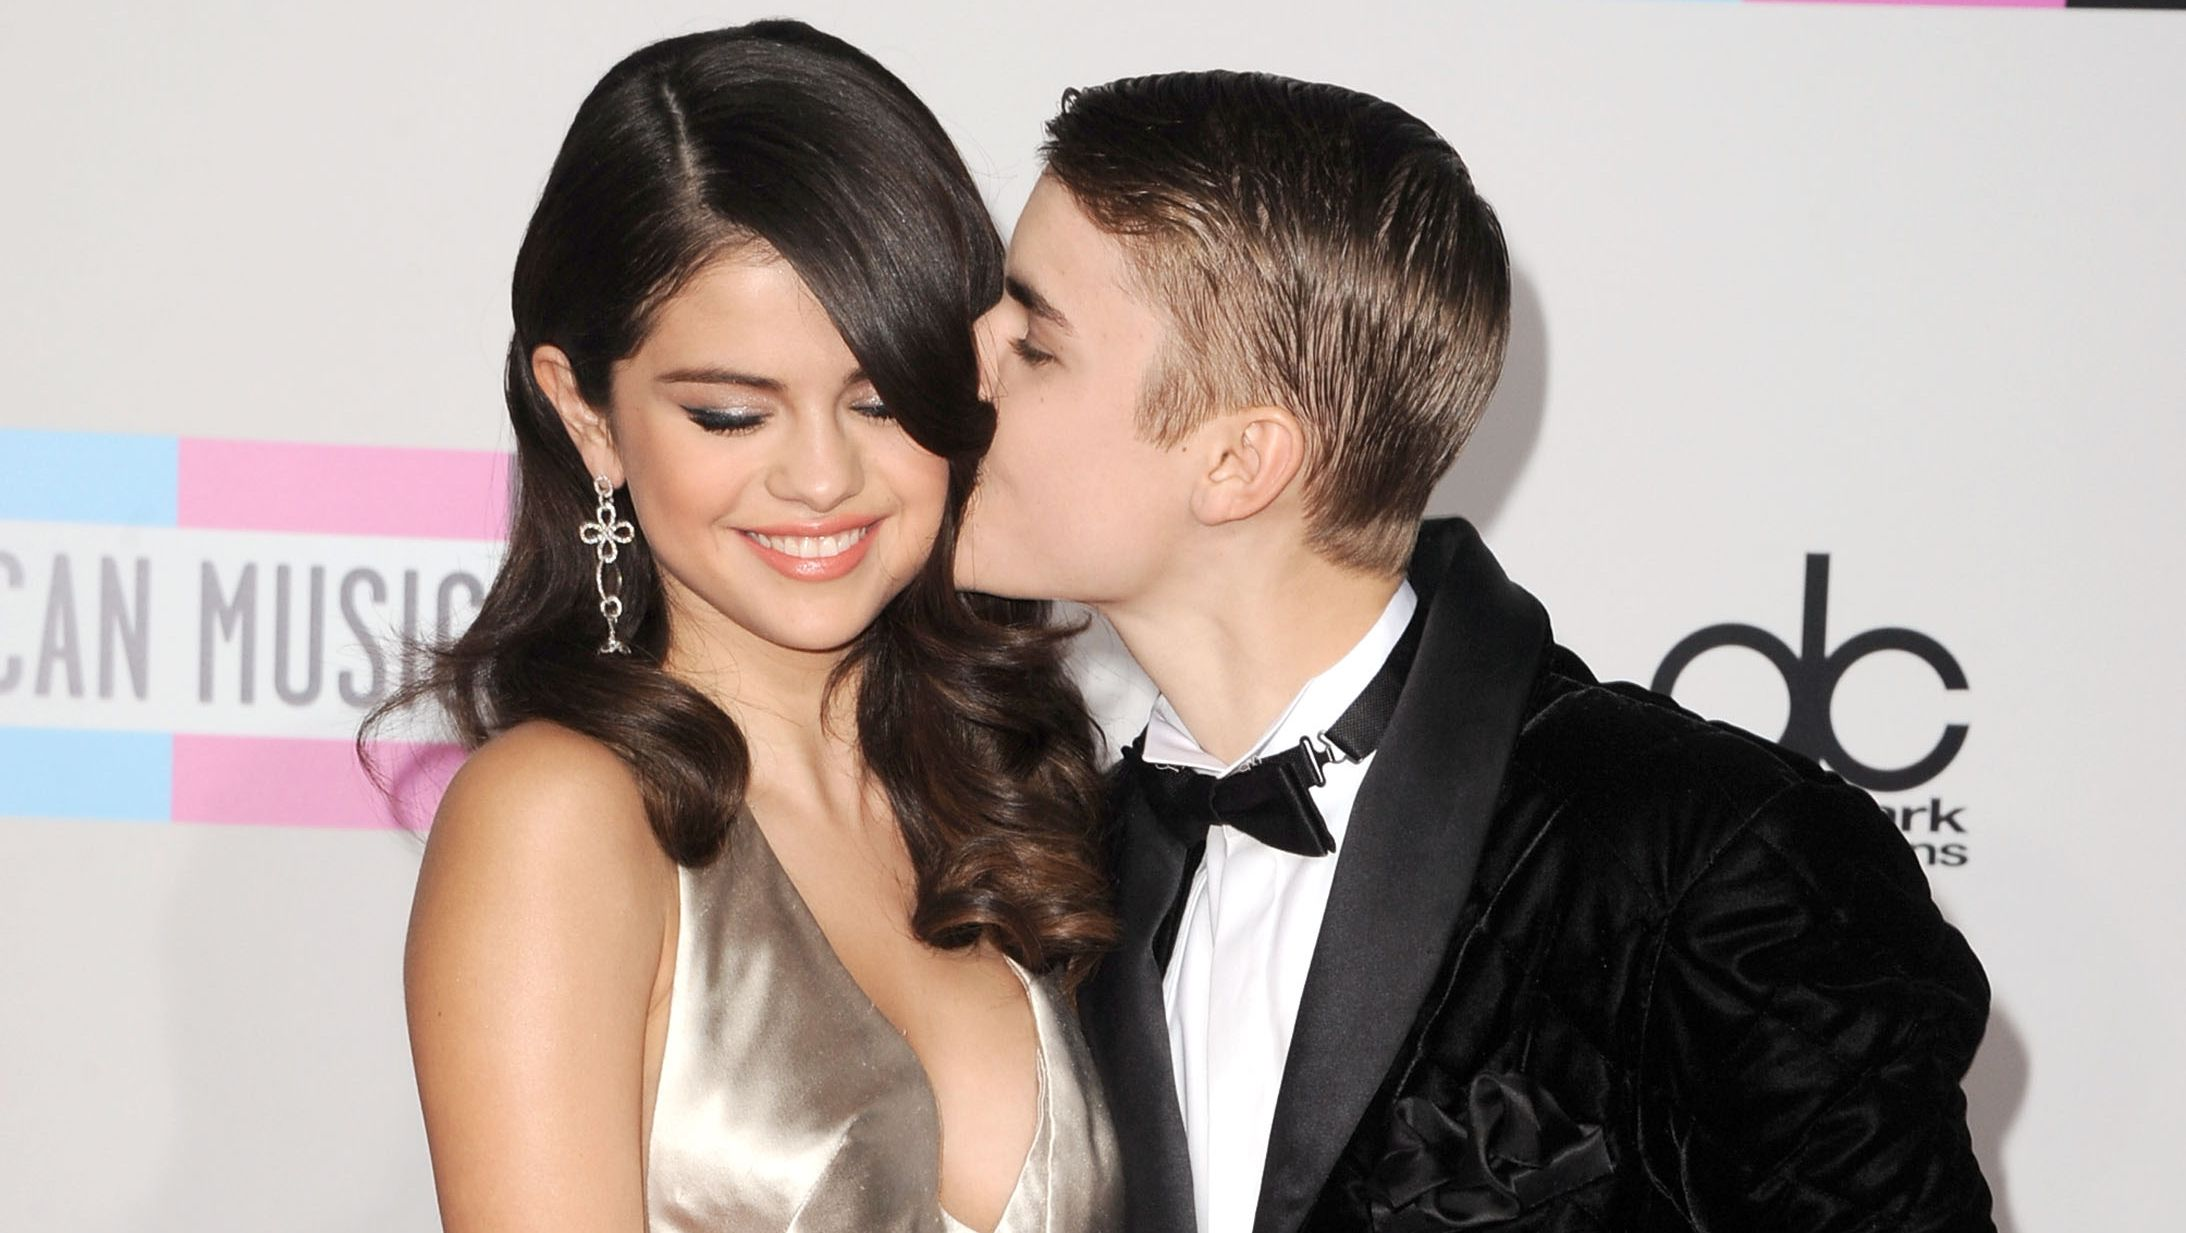 Justin Bieber and Selena Gomez's relationship timeline of ... Justin Bieber Selena Gomez 2009